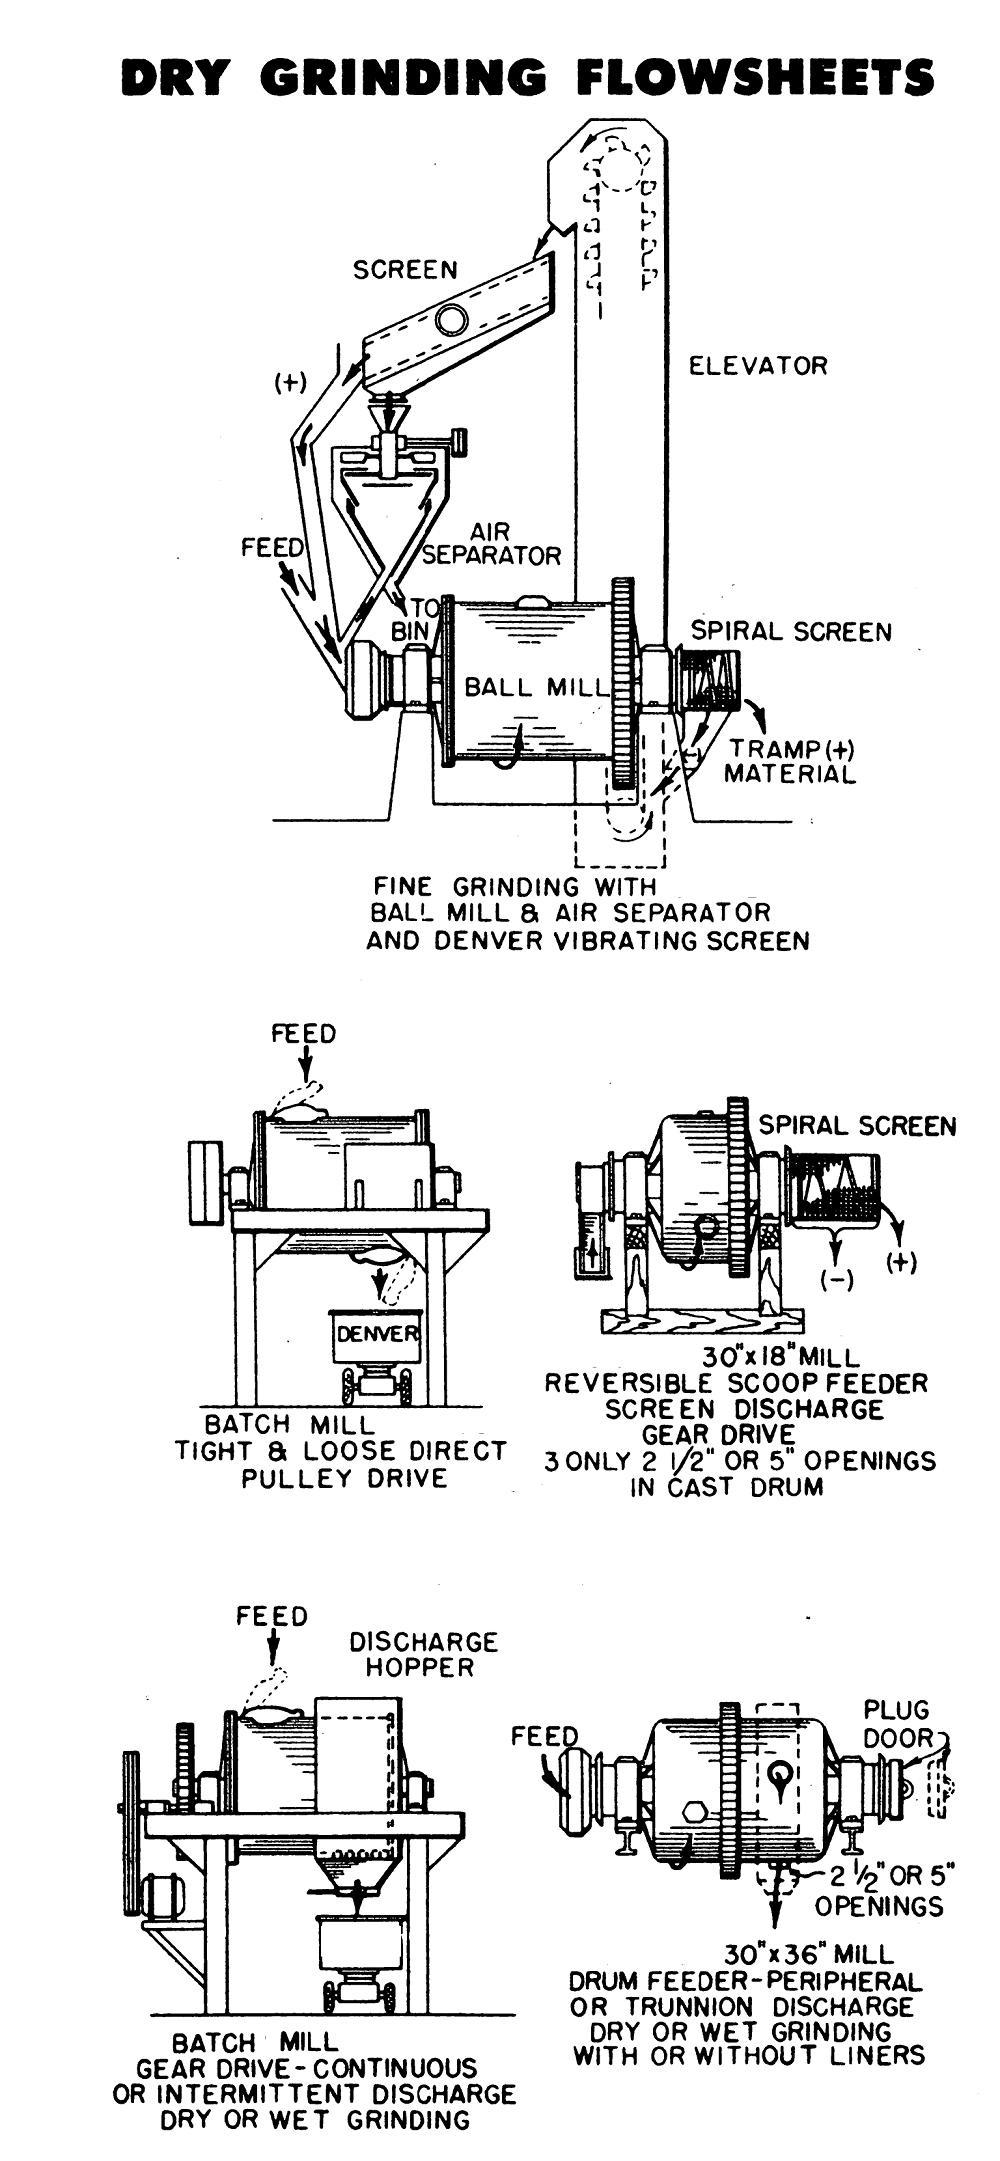 Dry Grinding Flowsheet Example